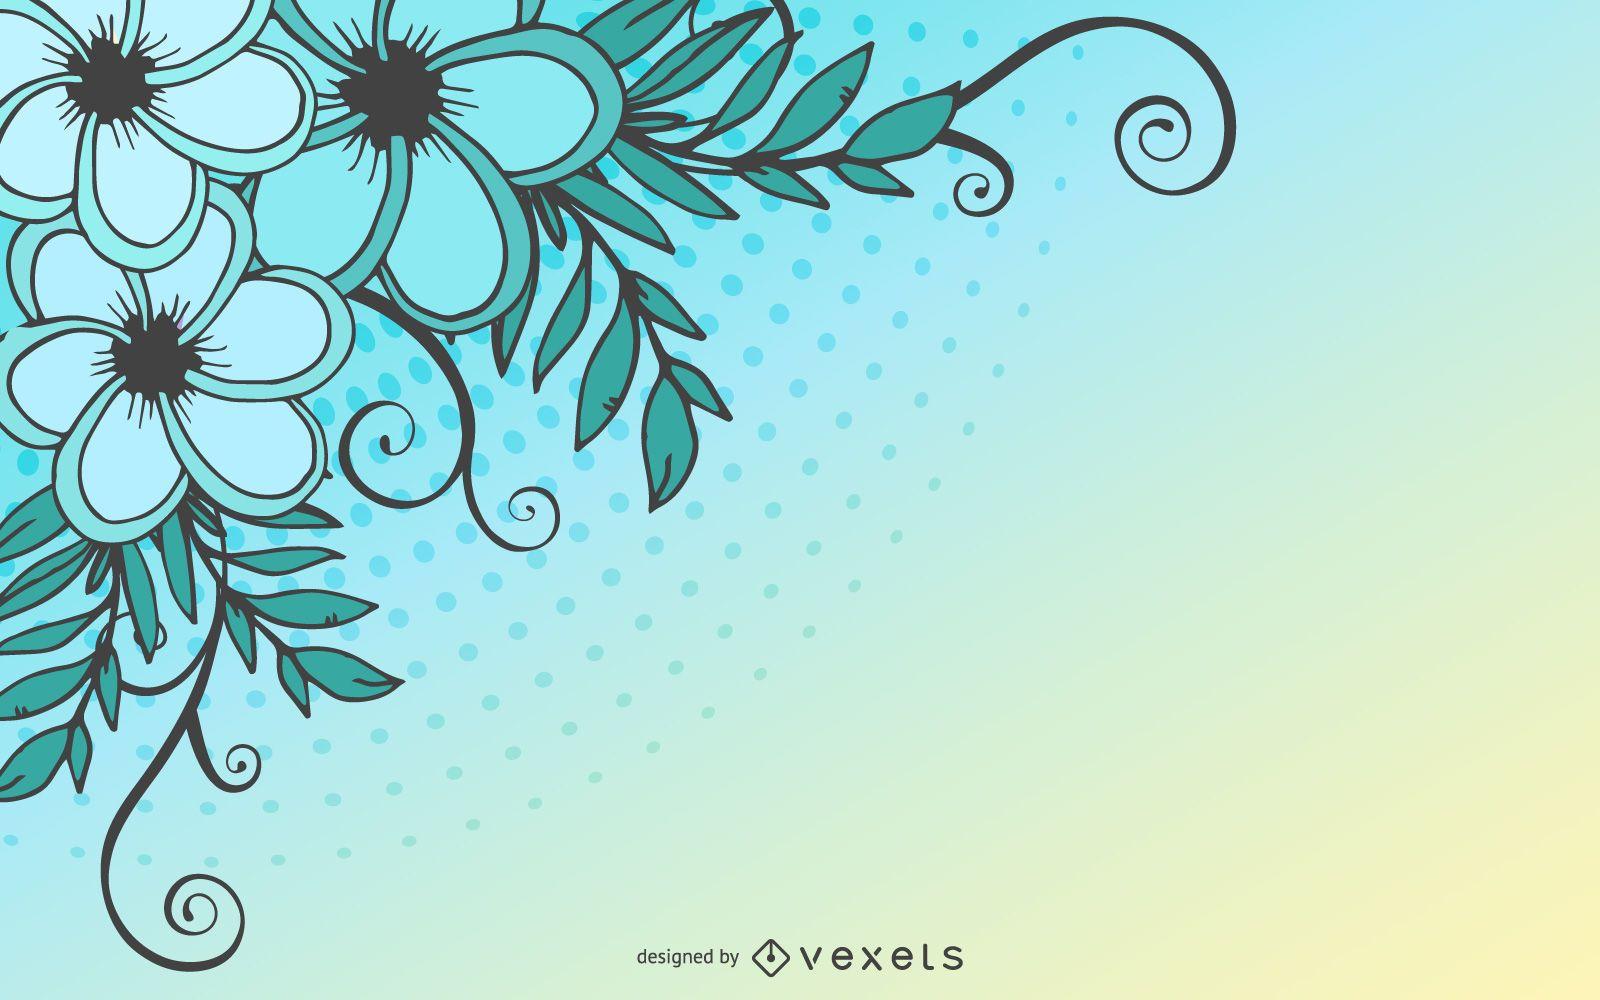 Swirling Floral Plant Halftones Background